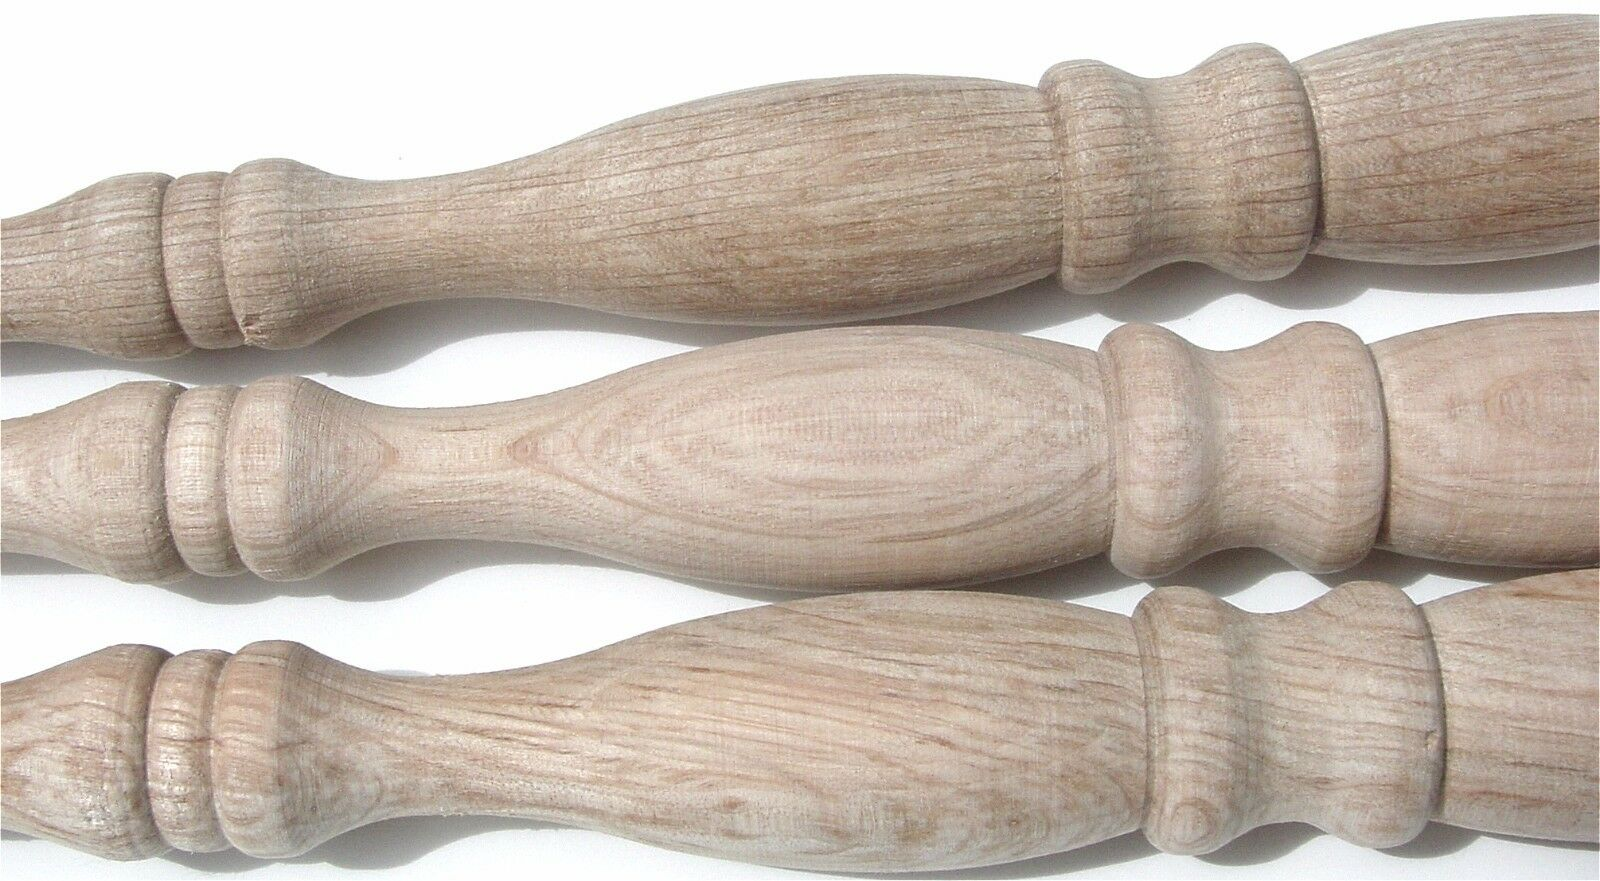 20 le oak fusi per le 20 culle & culle misura 9 cm ffc458